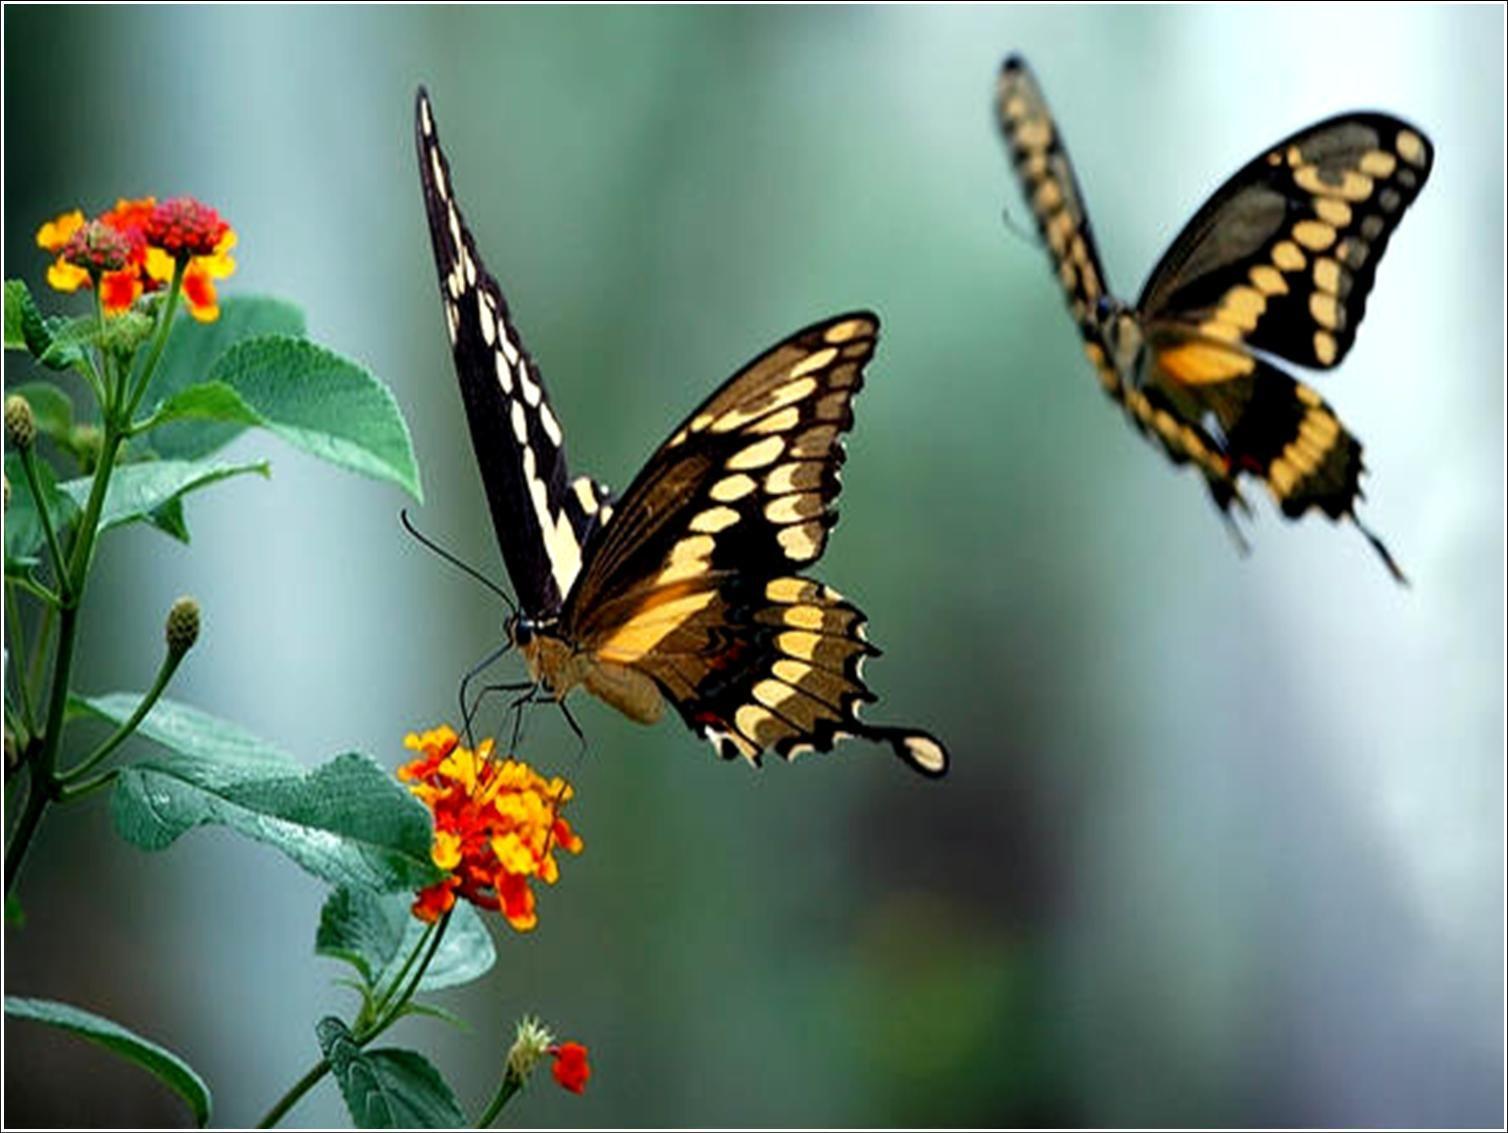 Fotos de borboletas lindas e maravilhosas